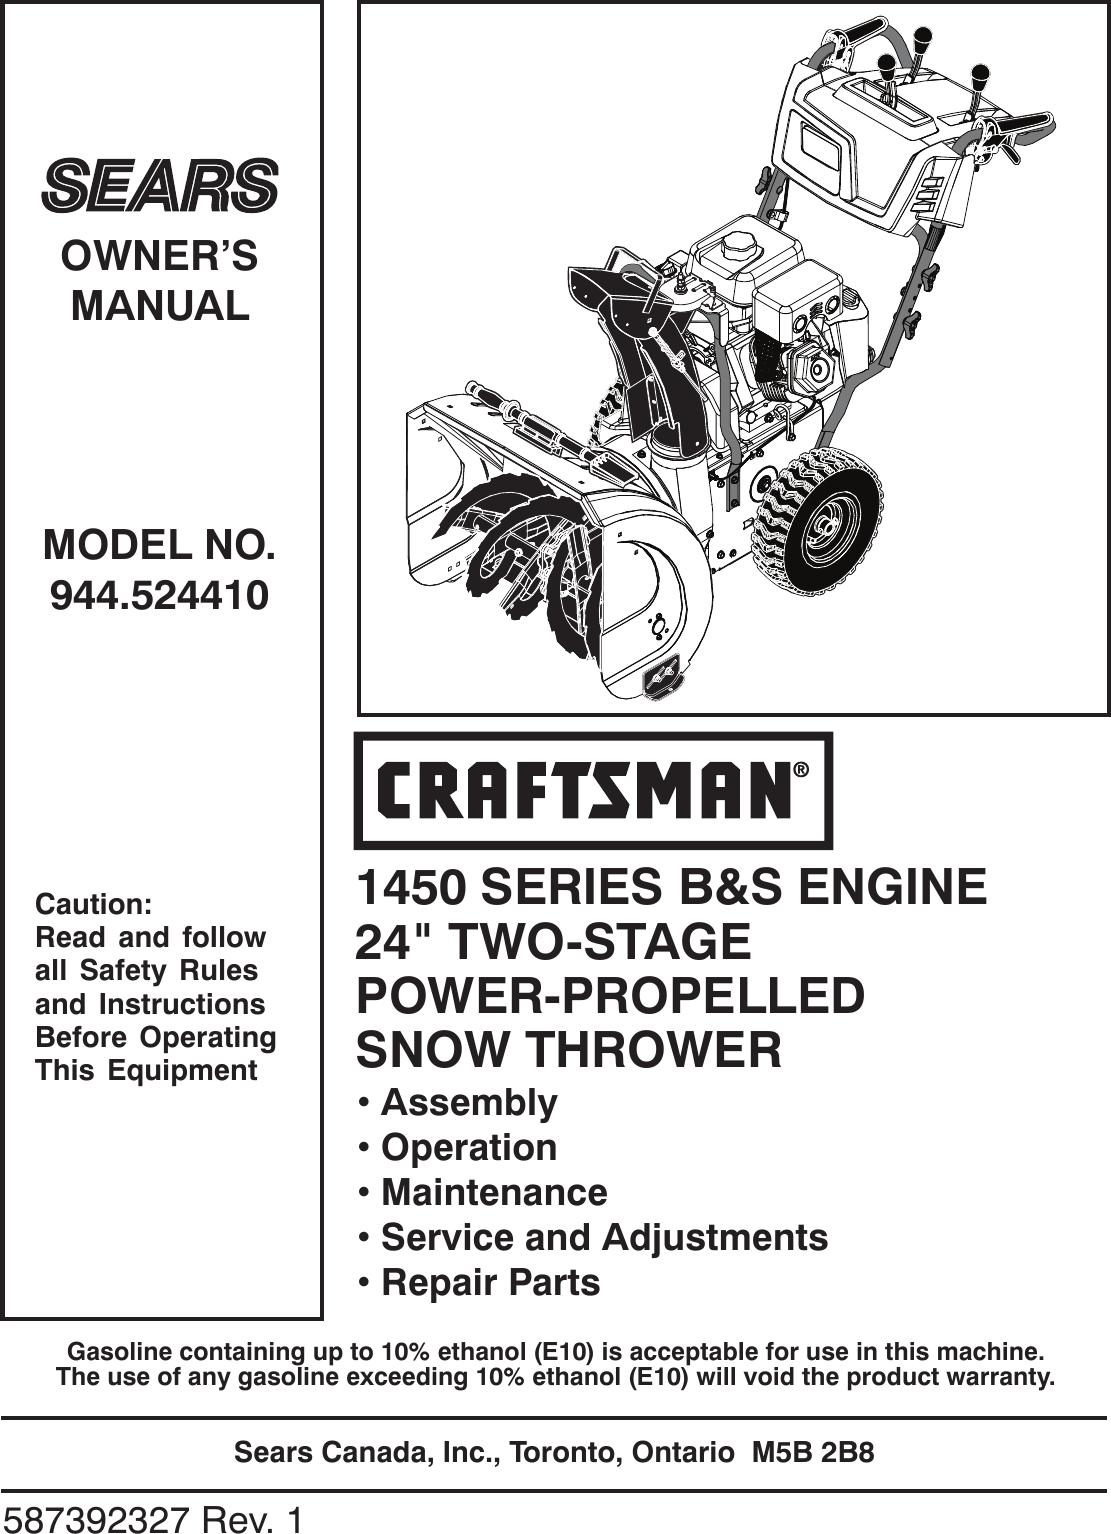 Craftsman Manual Ebook 19851995 Yamaha Moto4 200 225 250 350 Service Repair Array Sears Router Manuals Rh Banderol Us